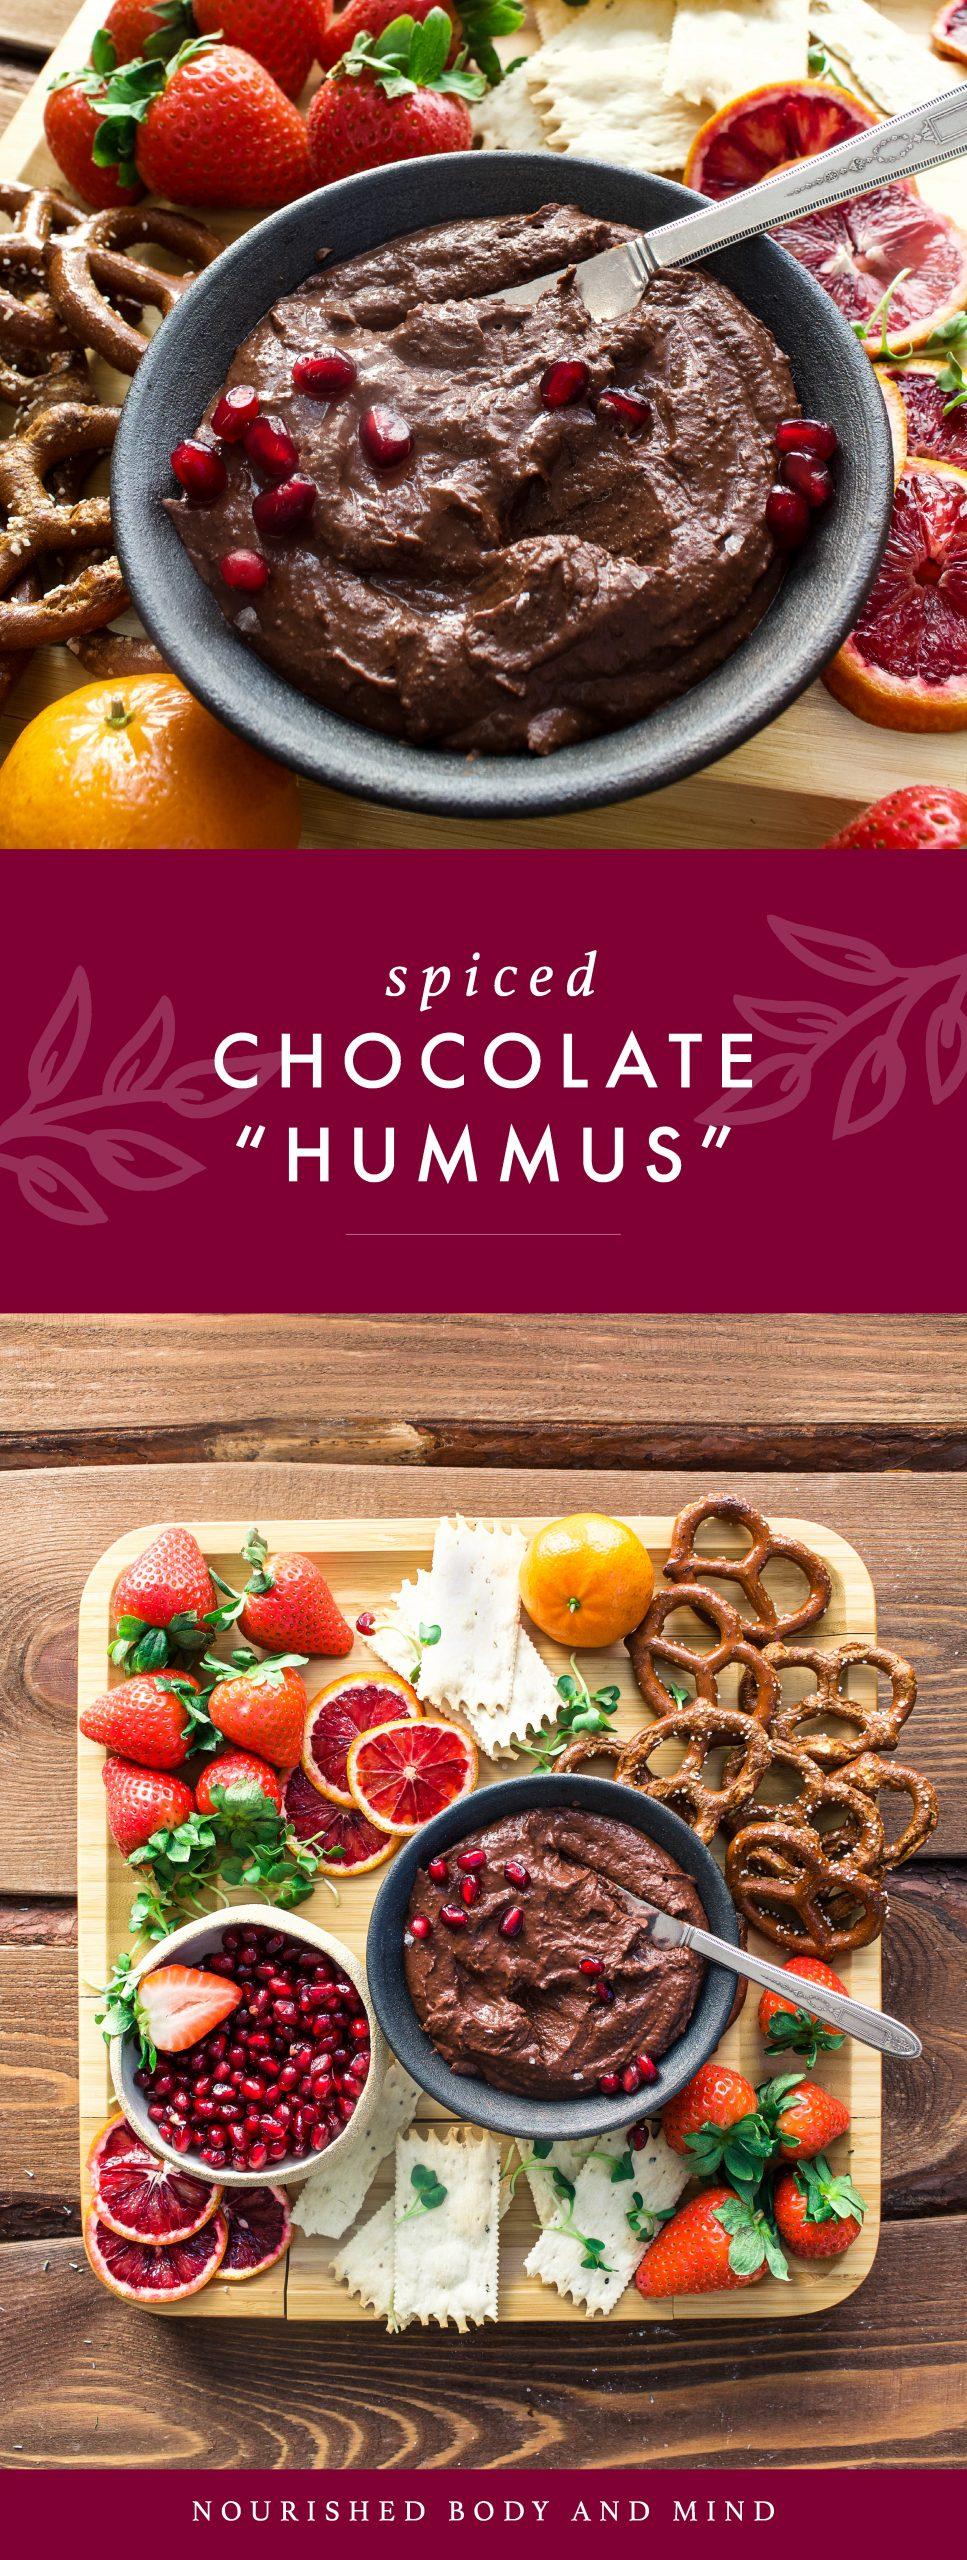 Spiced Chocolate Hummus